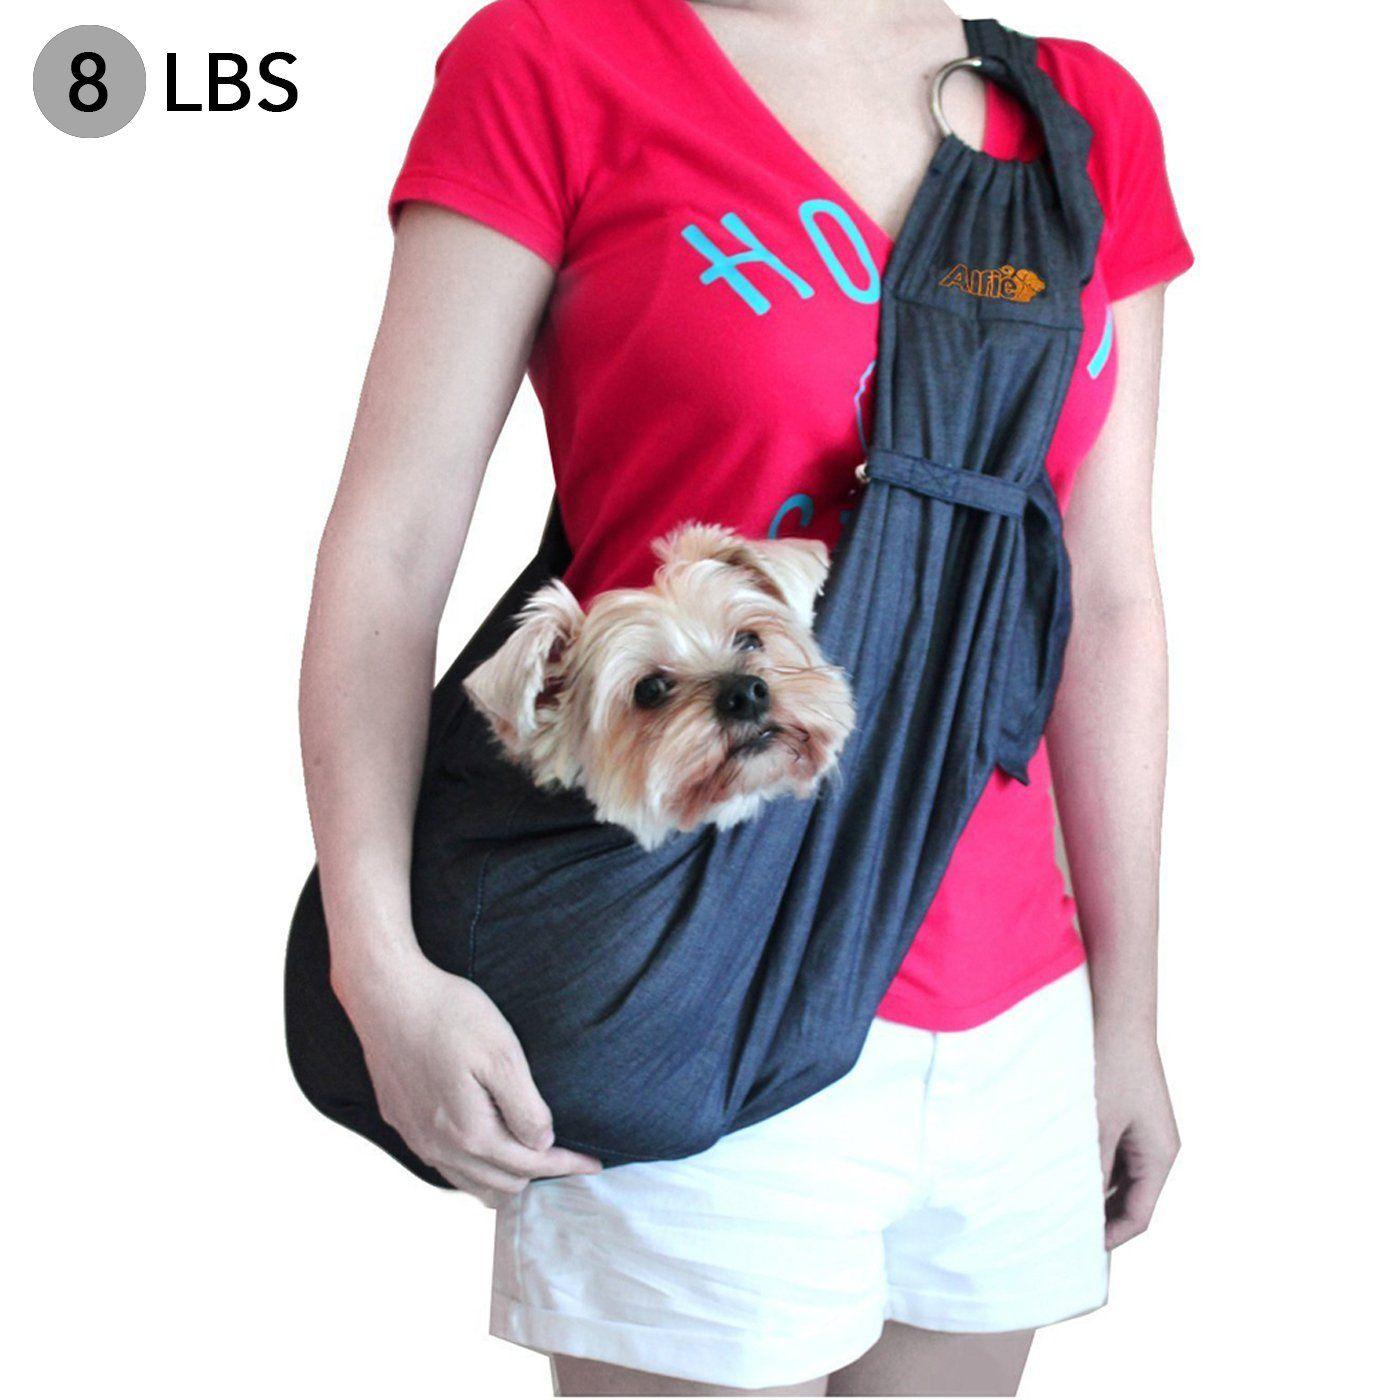 Alfie pet by petoga couture chico 20 revisible pet sling